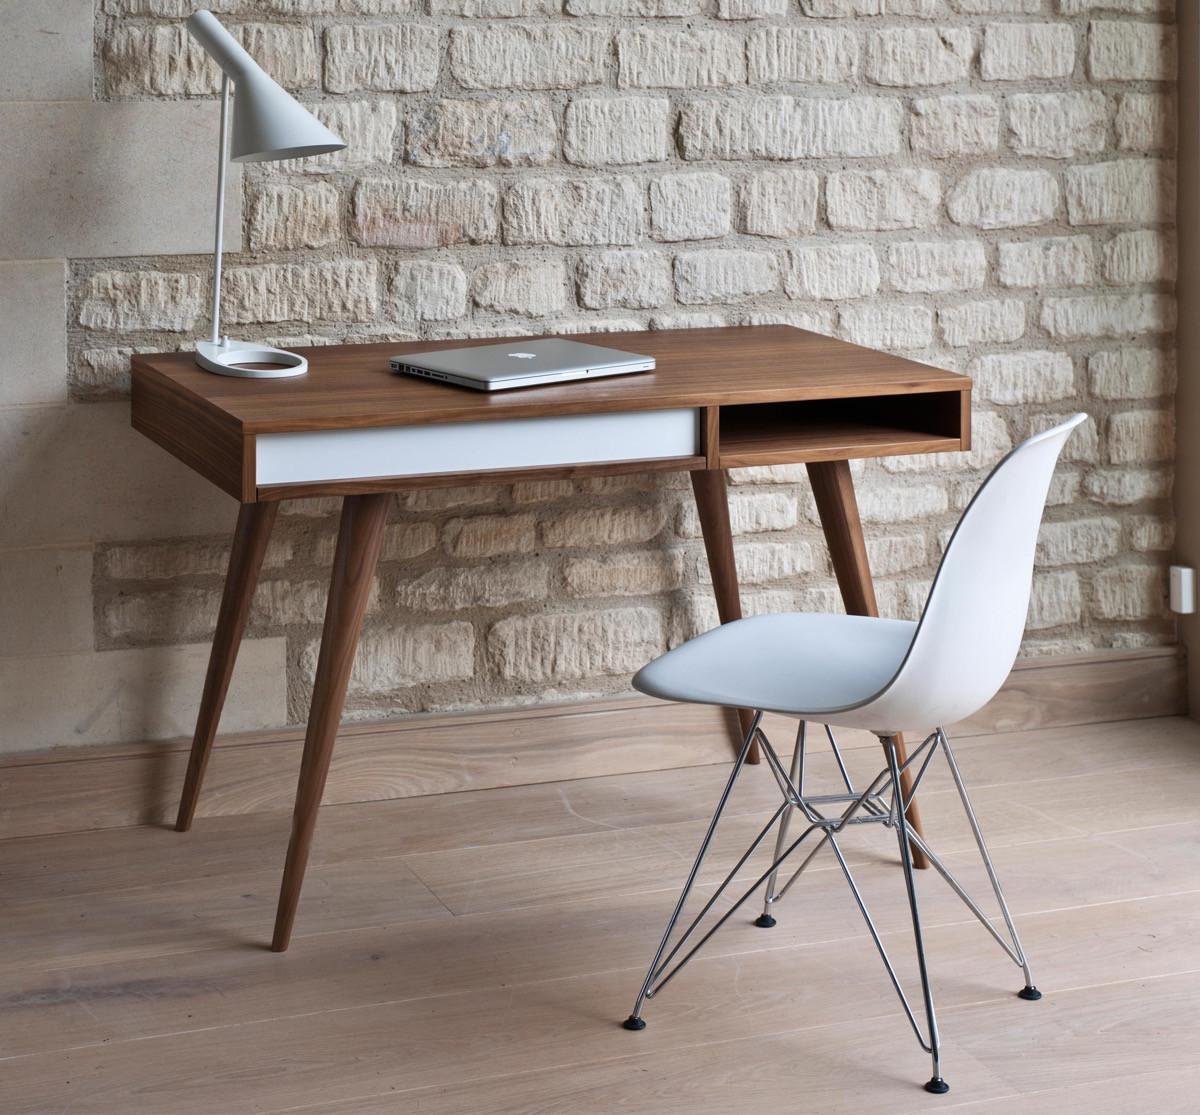 Best ideas about Office Desks For Home . Save or Pin Unique Home fice Desks Now.